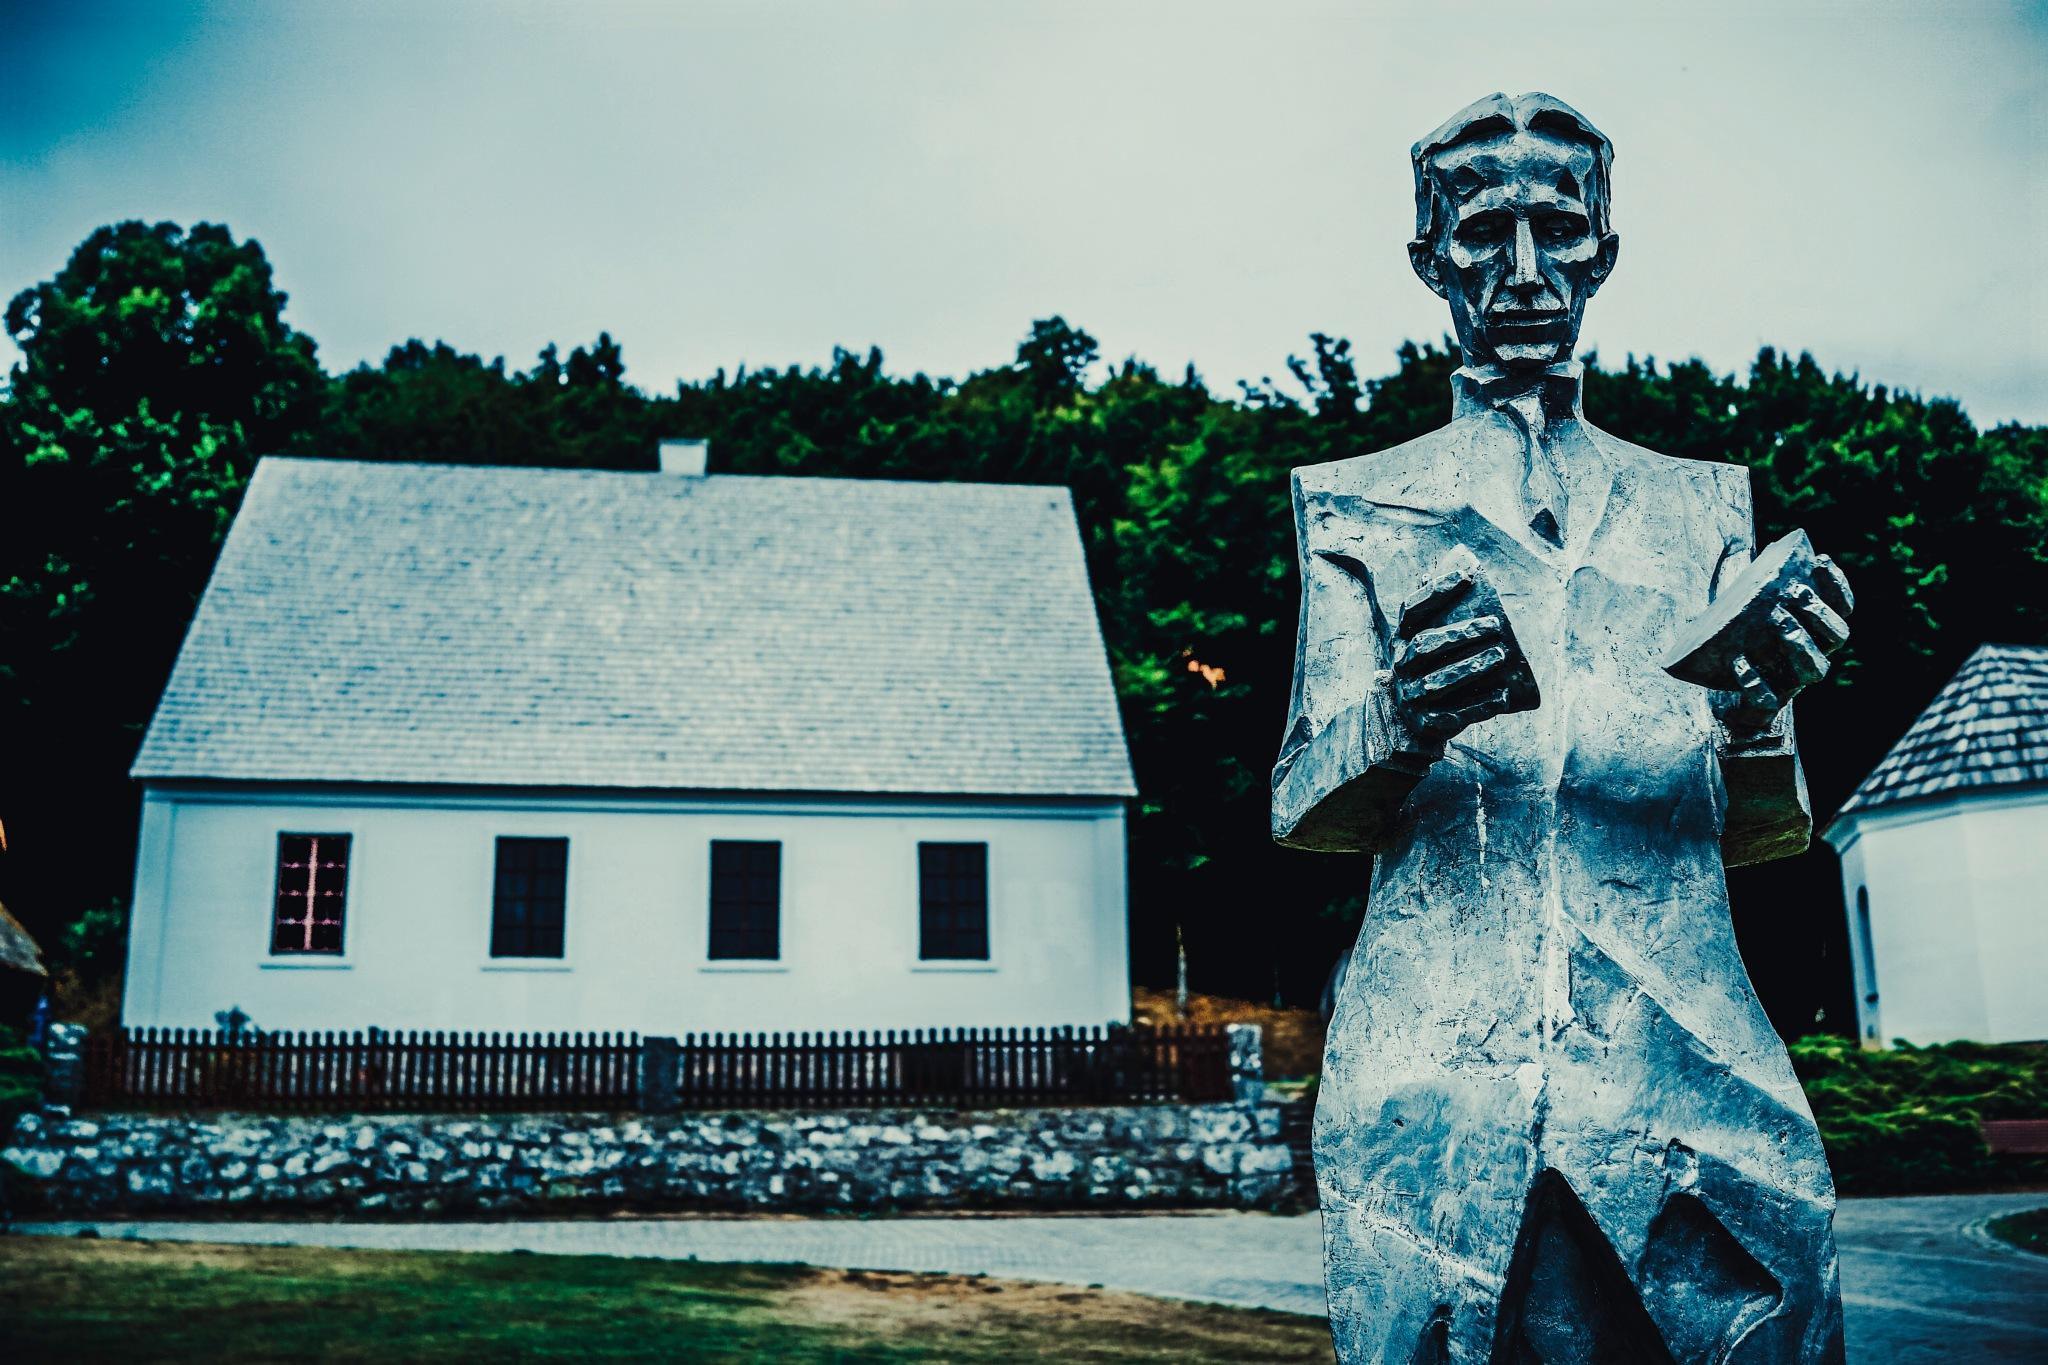 NIKOLA TESLA AT HIS  HOME  by Goran Jorganovich